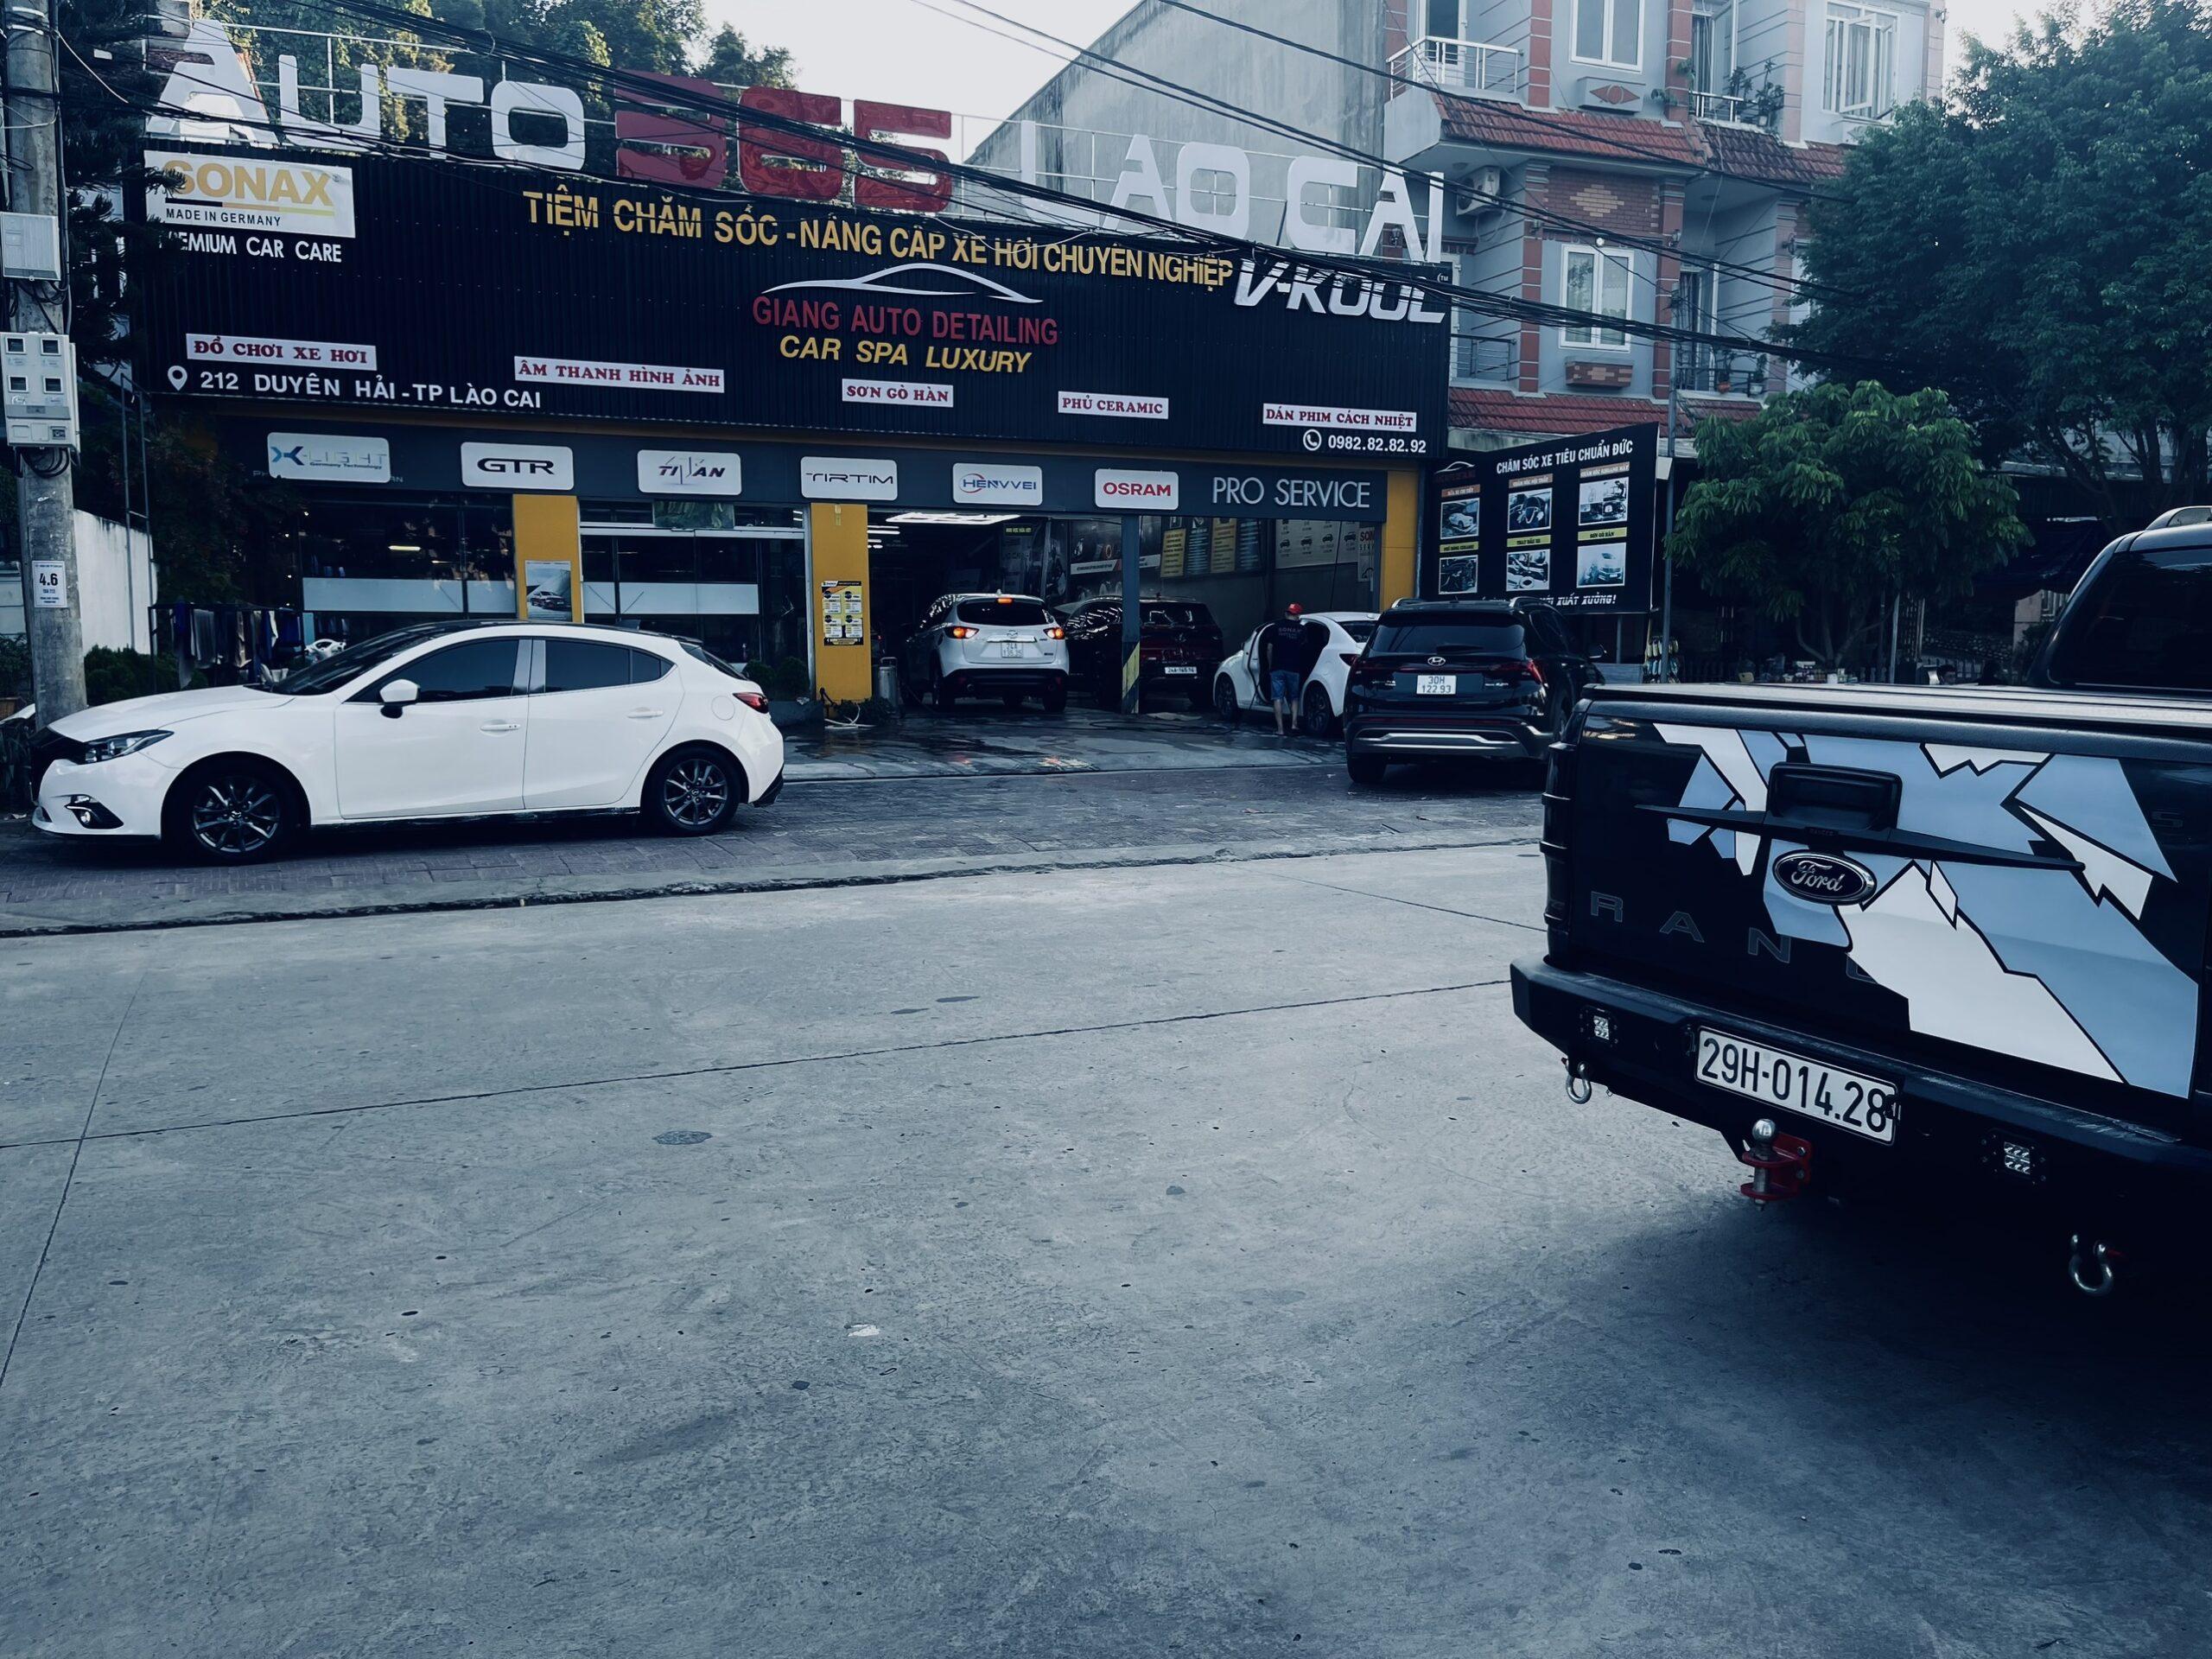 Trung tâm AUTO365 Lào Cai